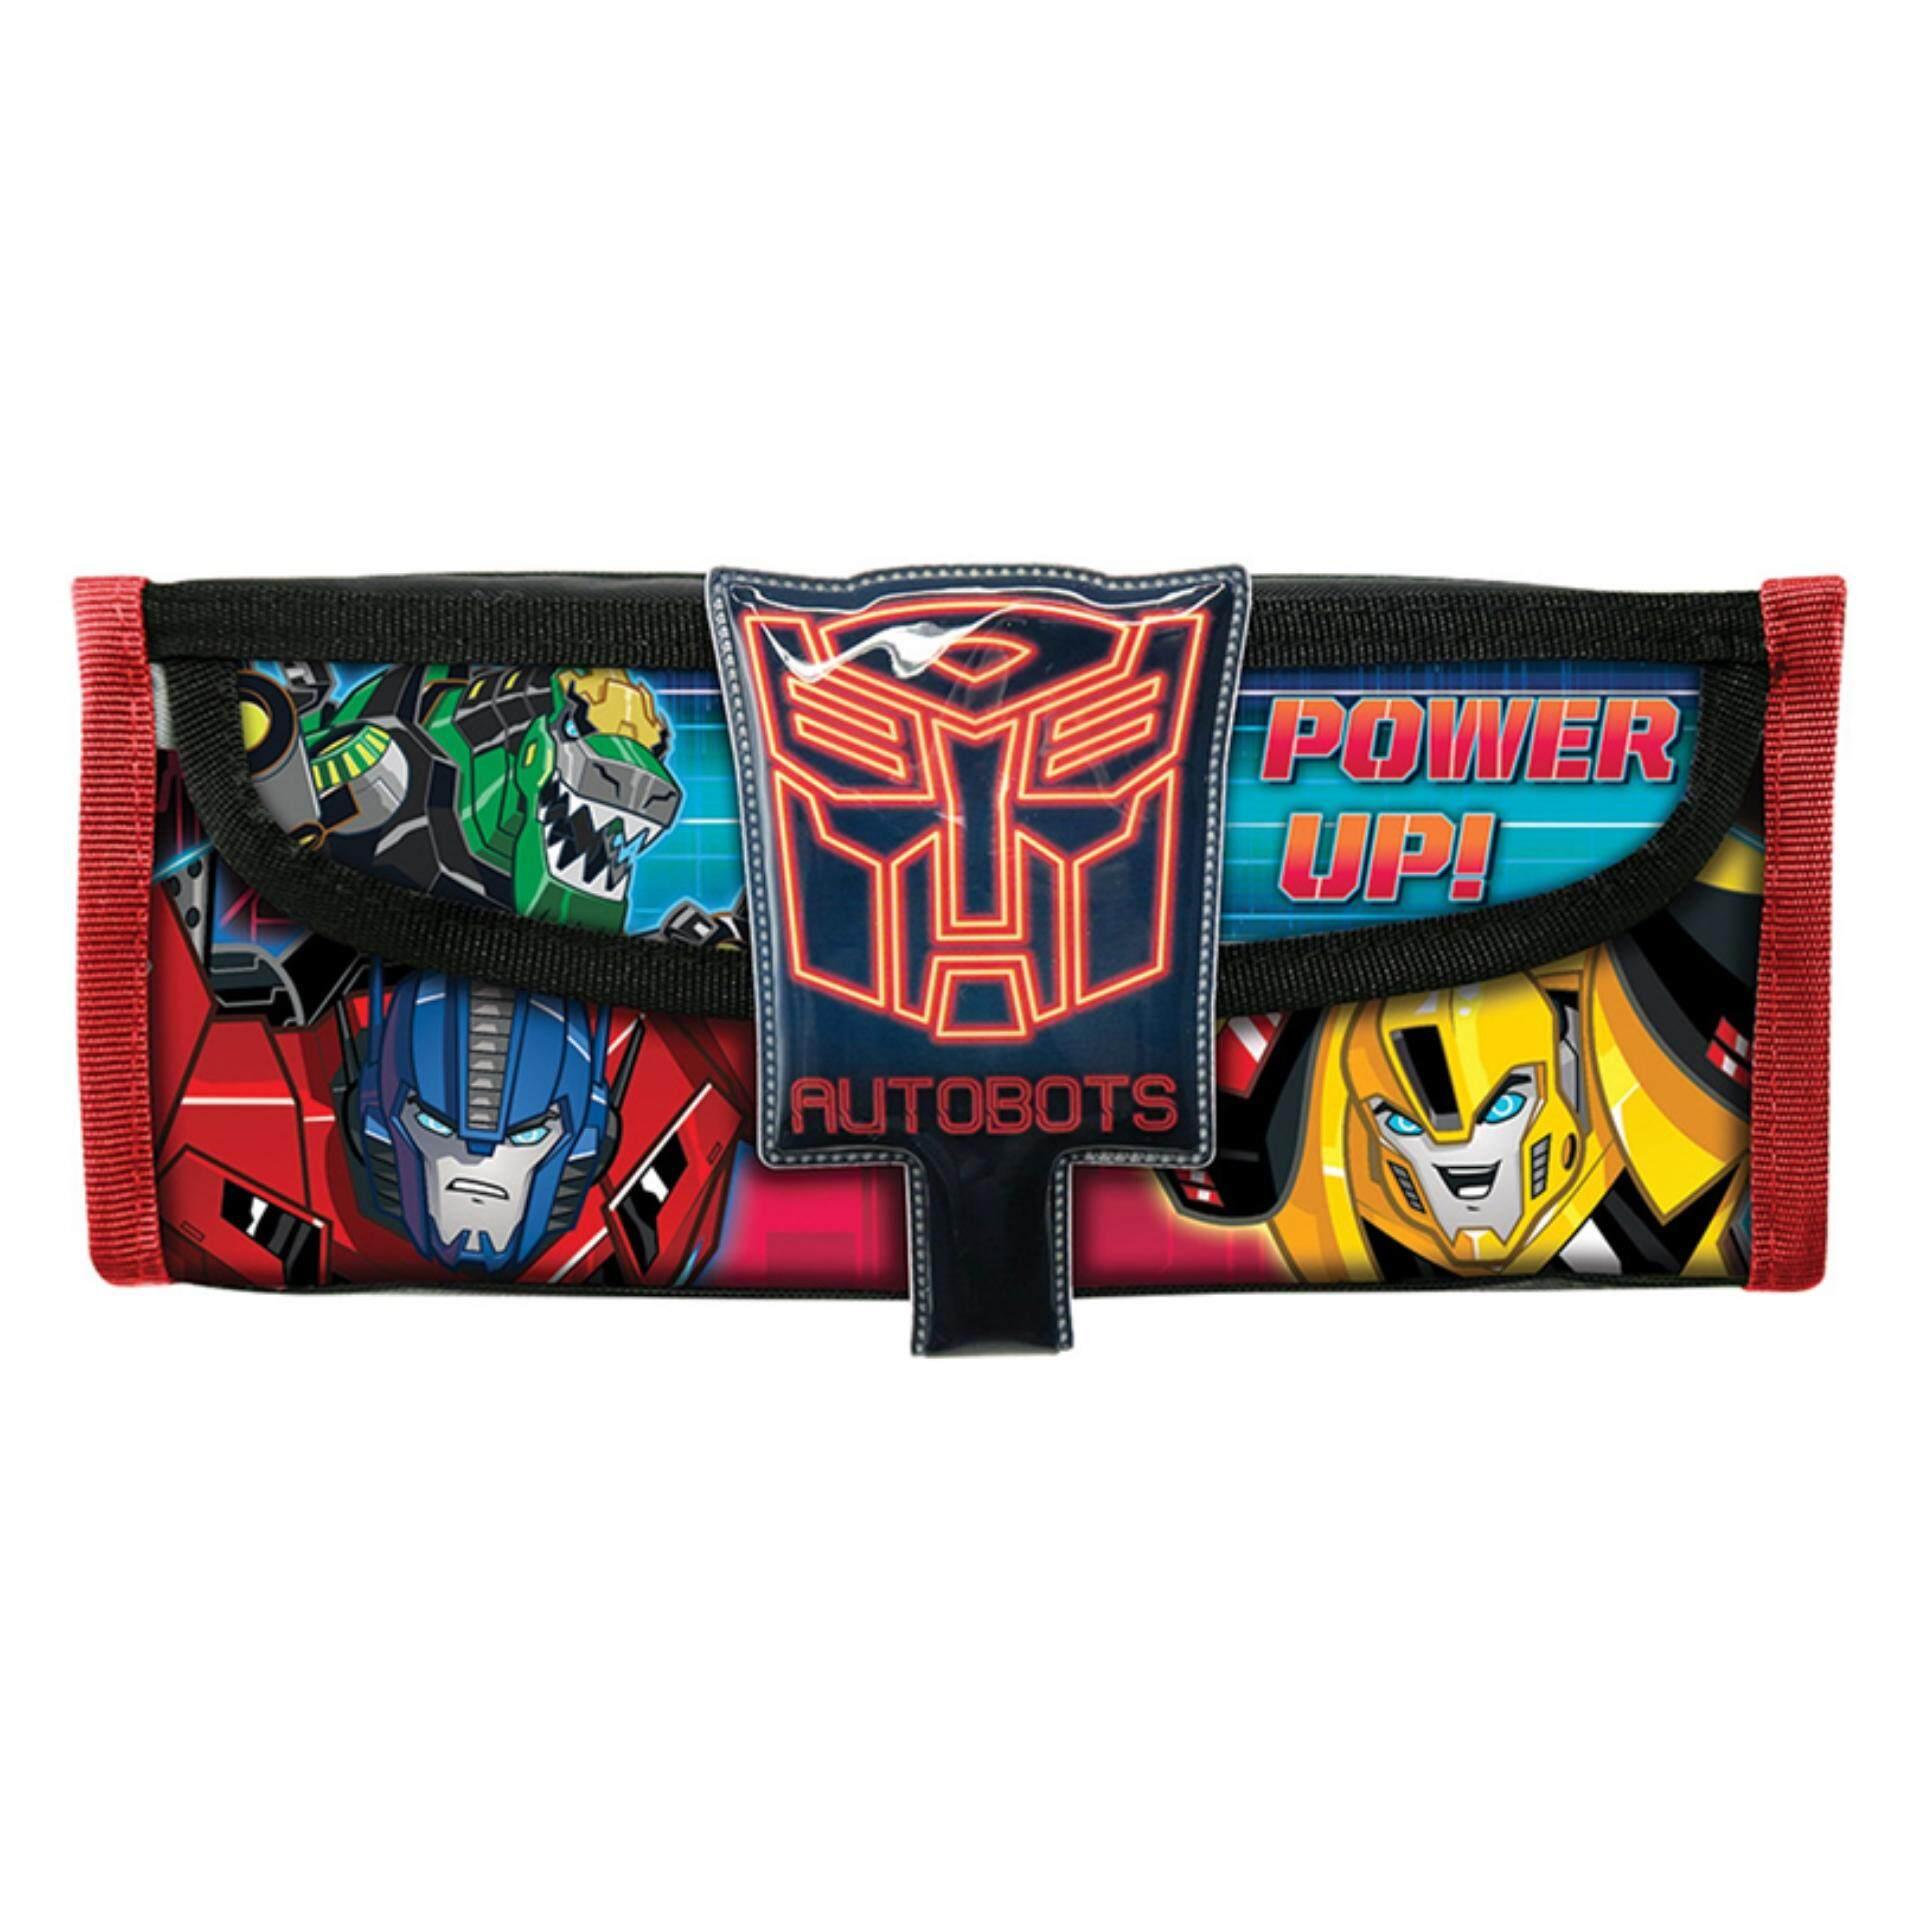 Transformers Square Pencil Bag With Pocket - Black Colour